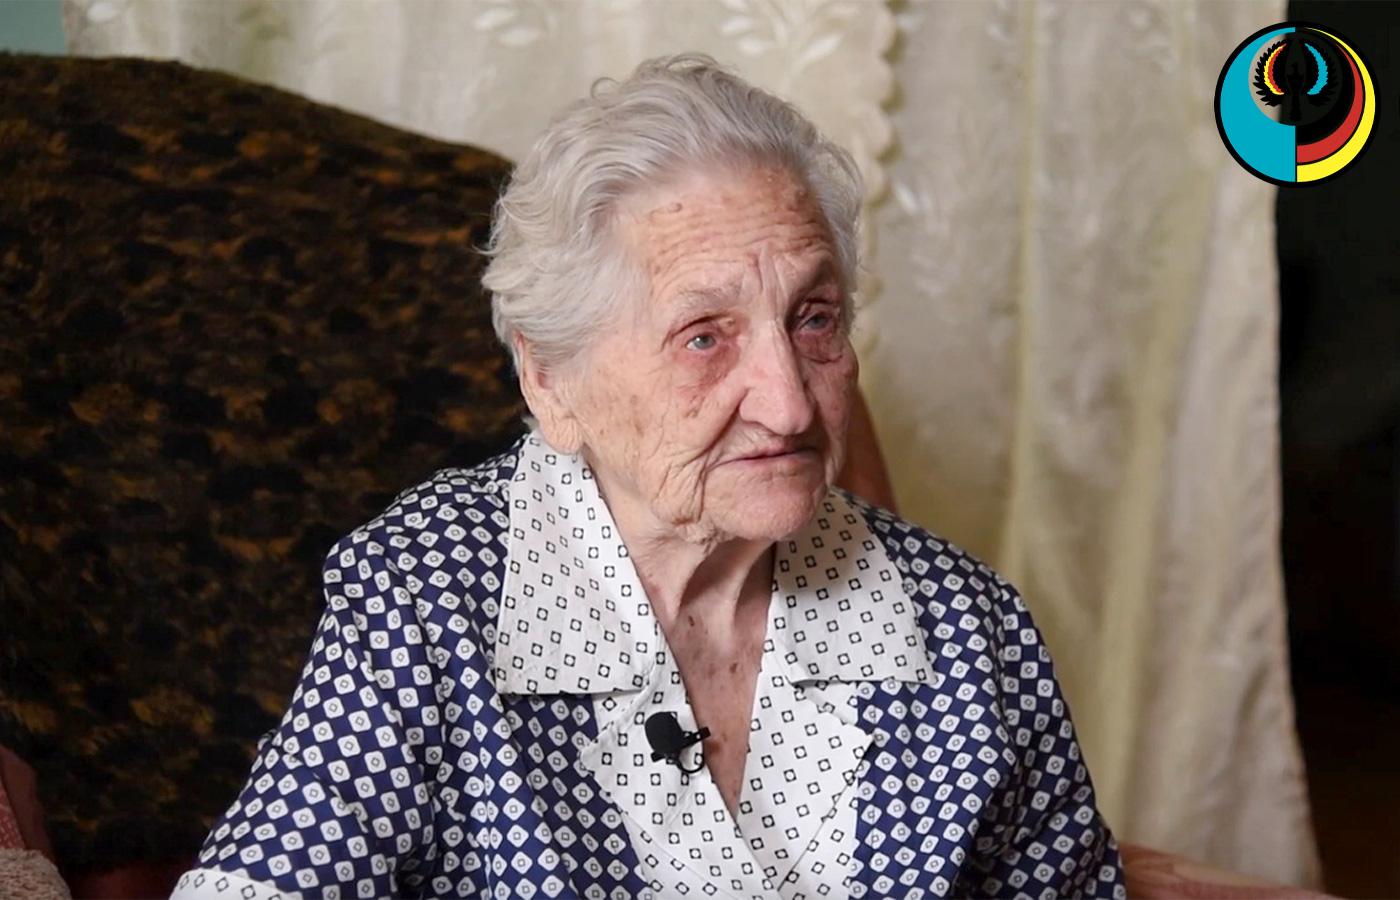 ВИДЕО: Елена Балабина (Швагерус): «Как война началась, я сама себе пробивала дорогу…»